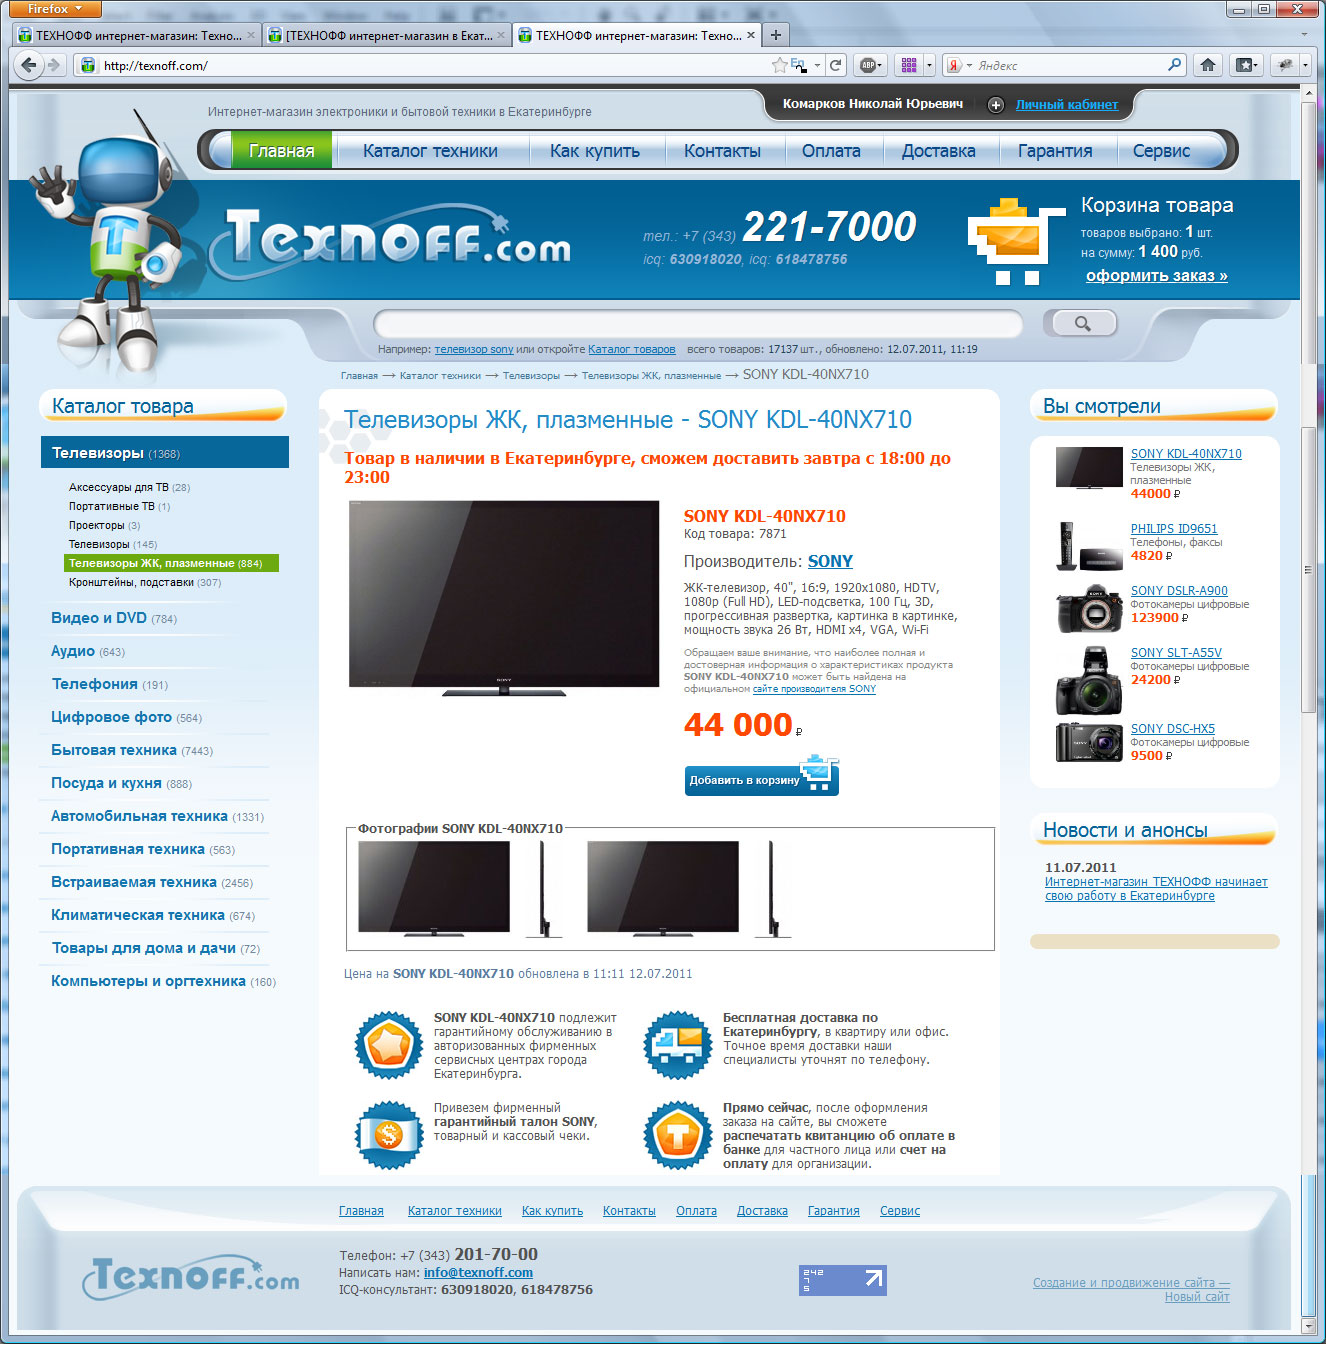 Технофф Интернет Магазин Екатеринбург Каталог